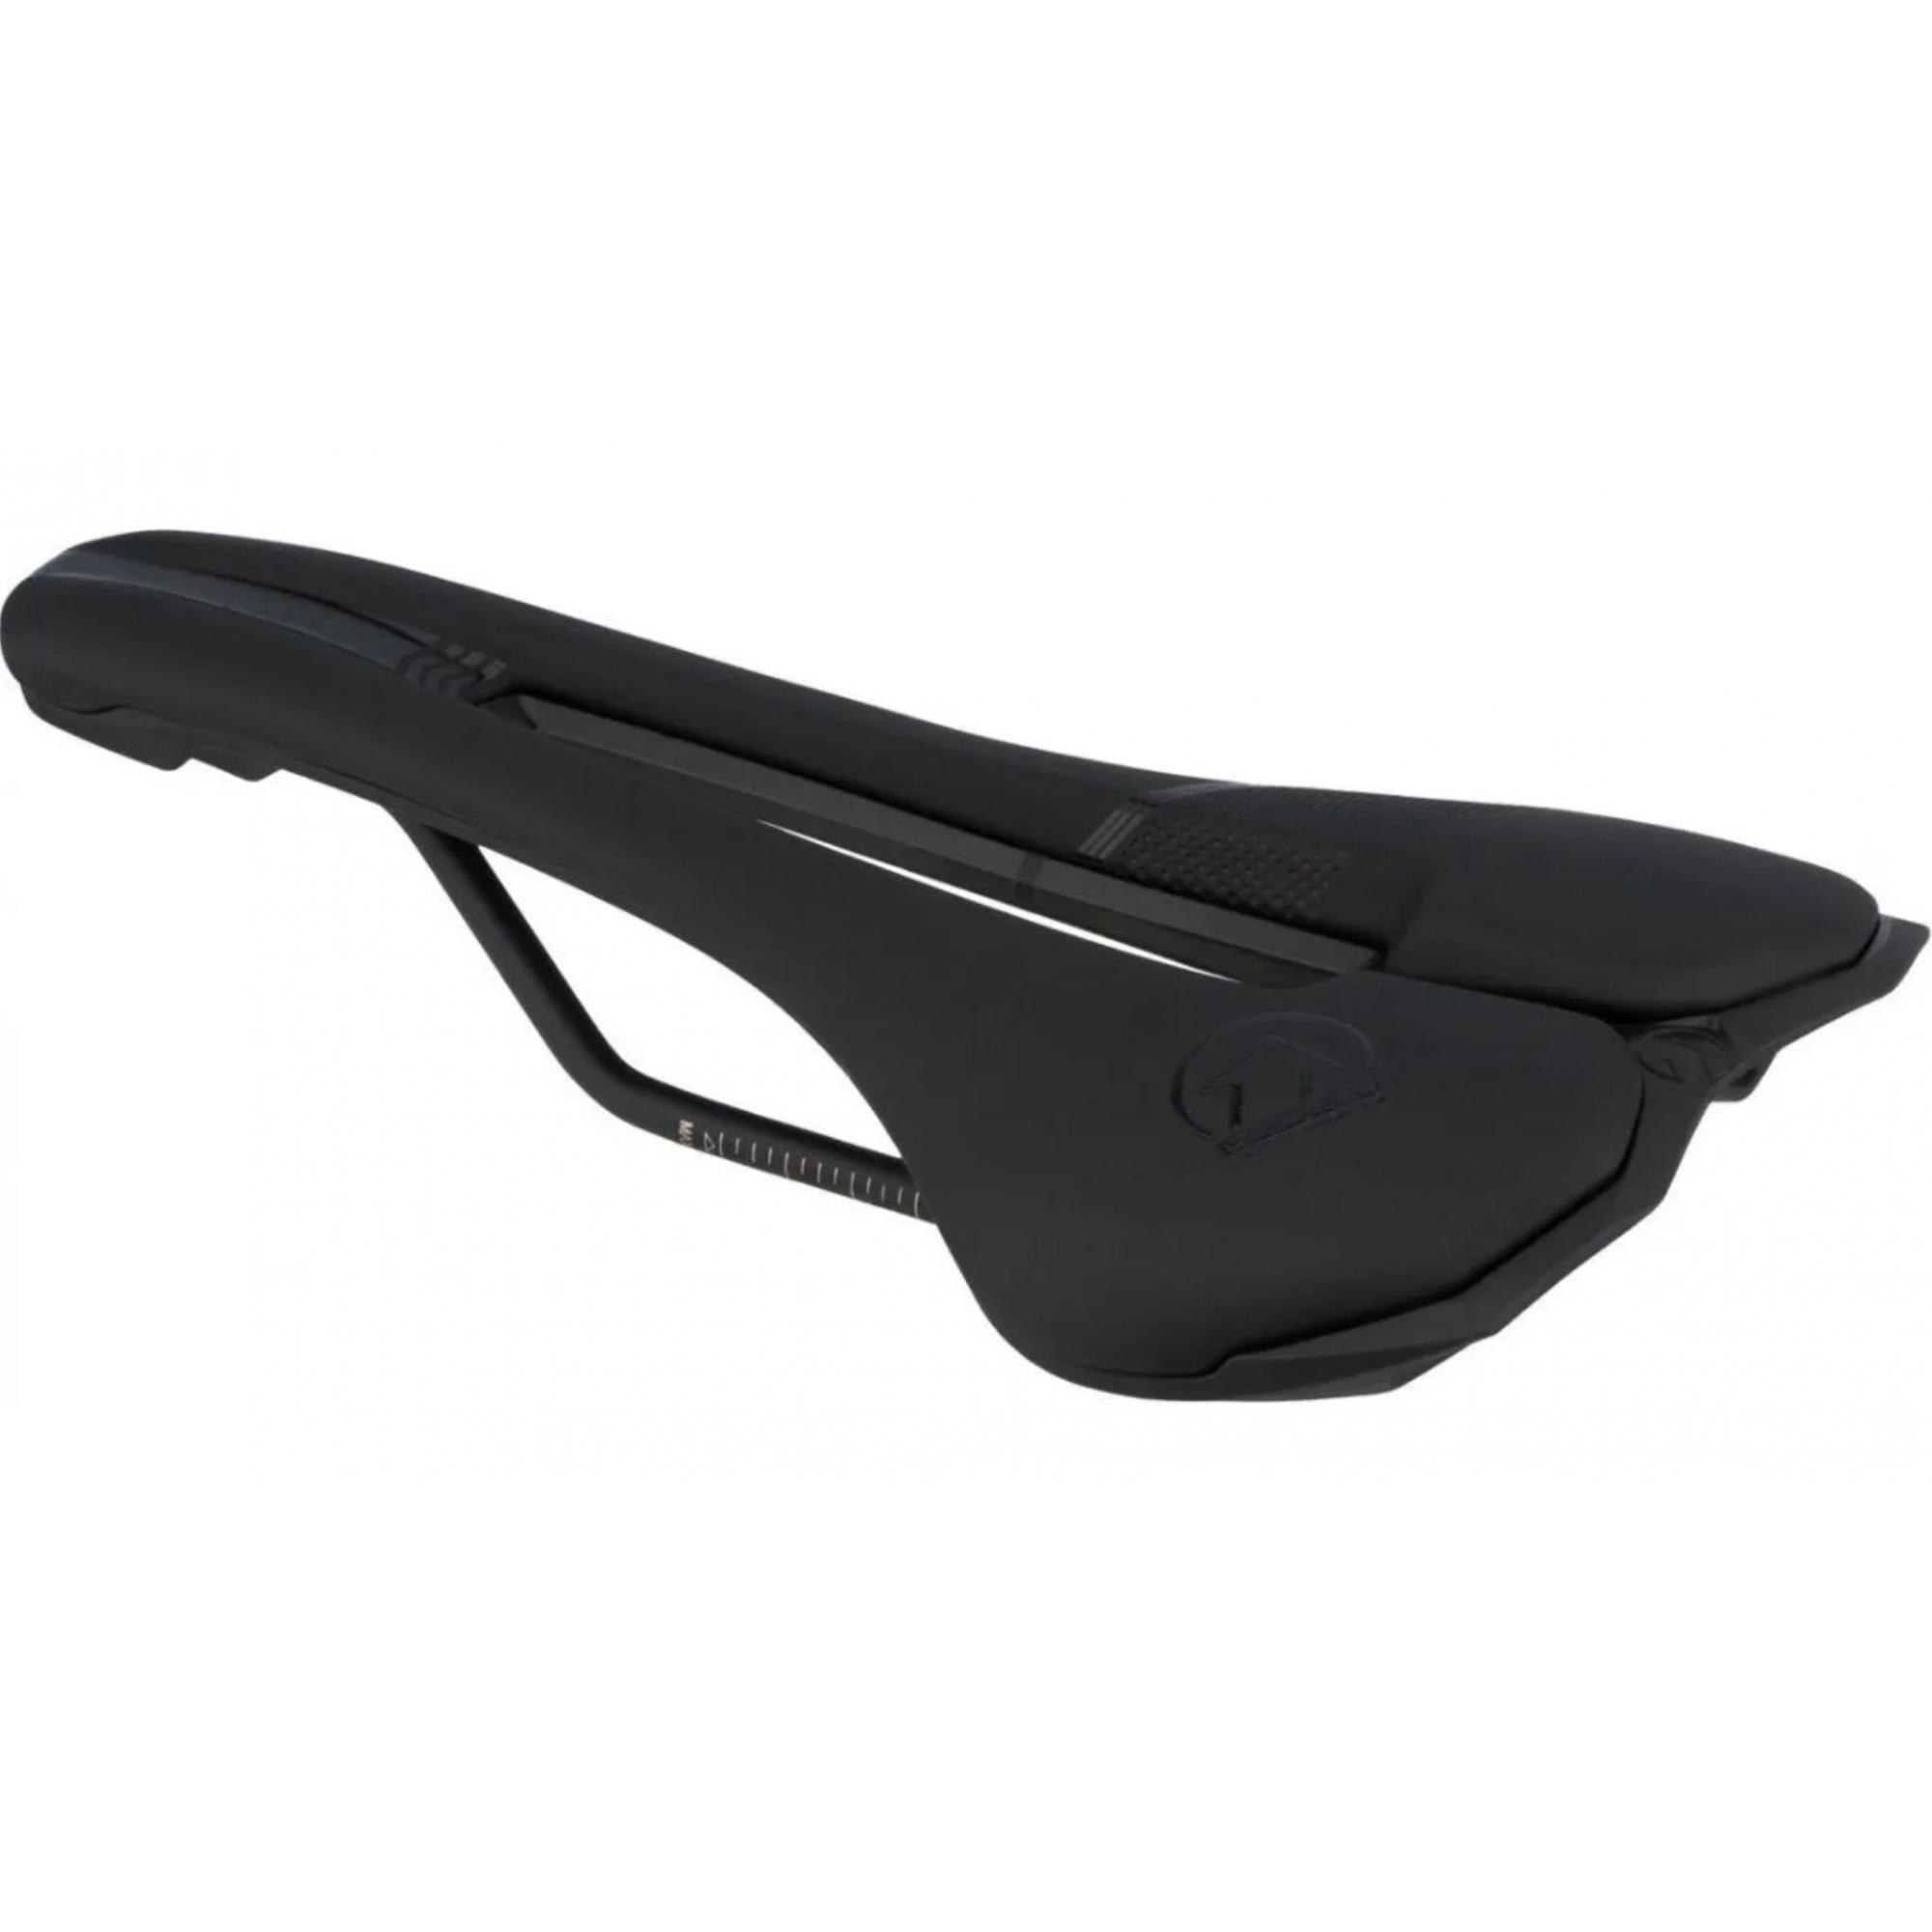 Selim Shimano Pro Griffon Performance Af 142mm Carbono 210gr